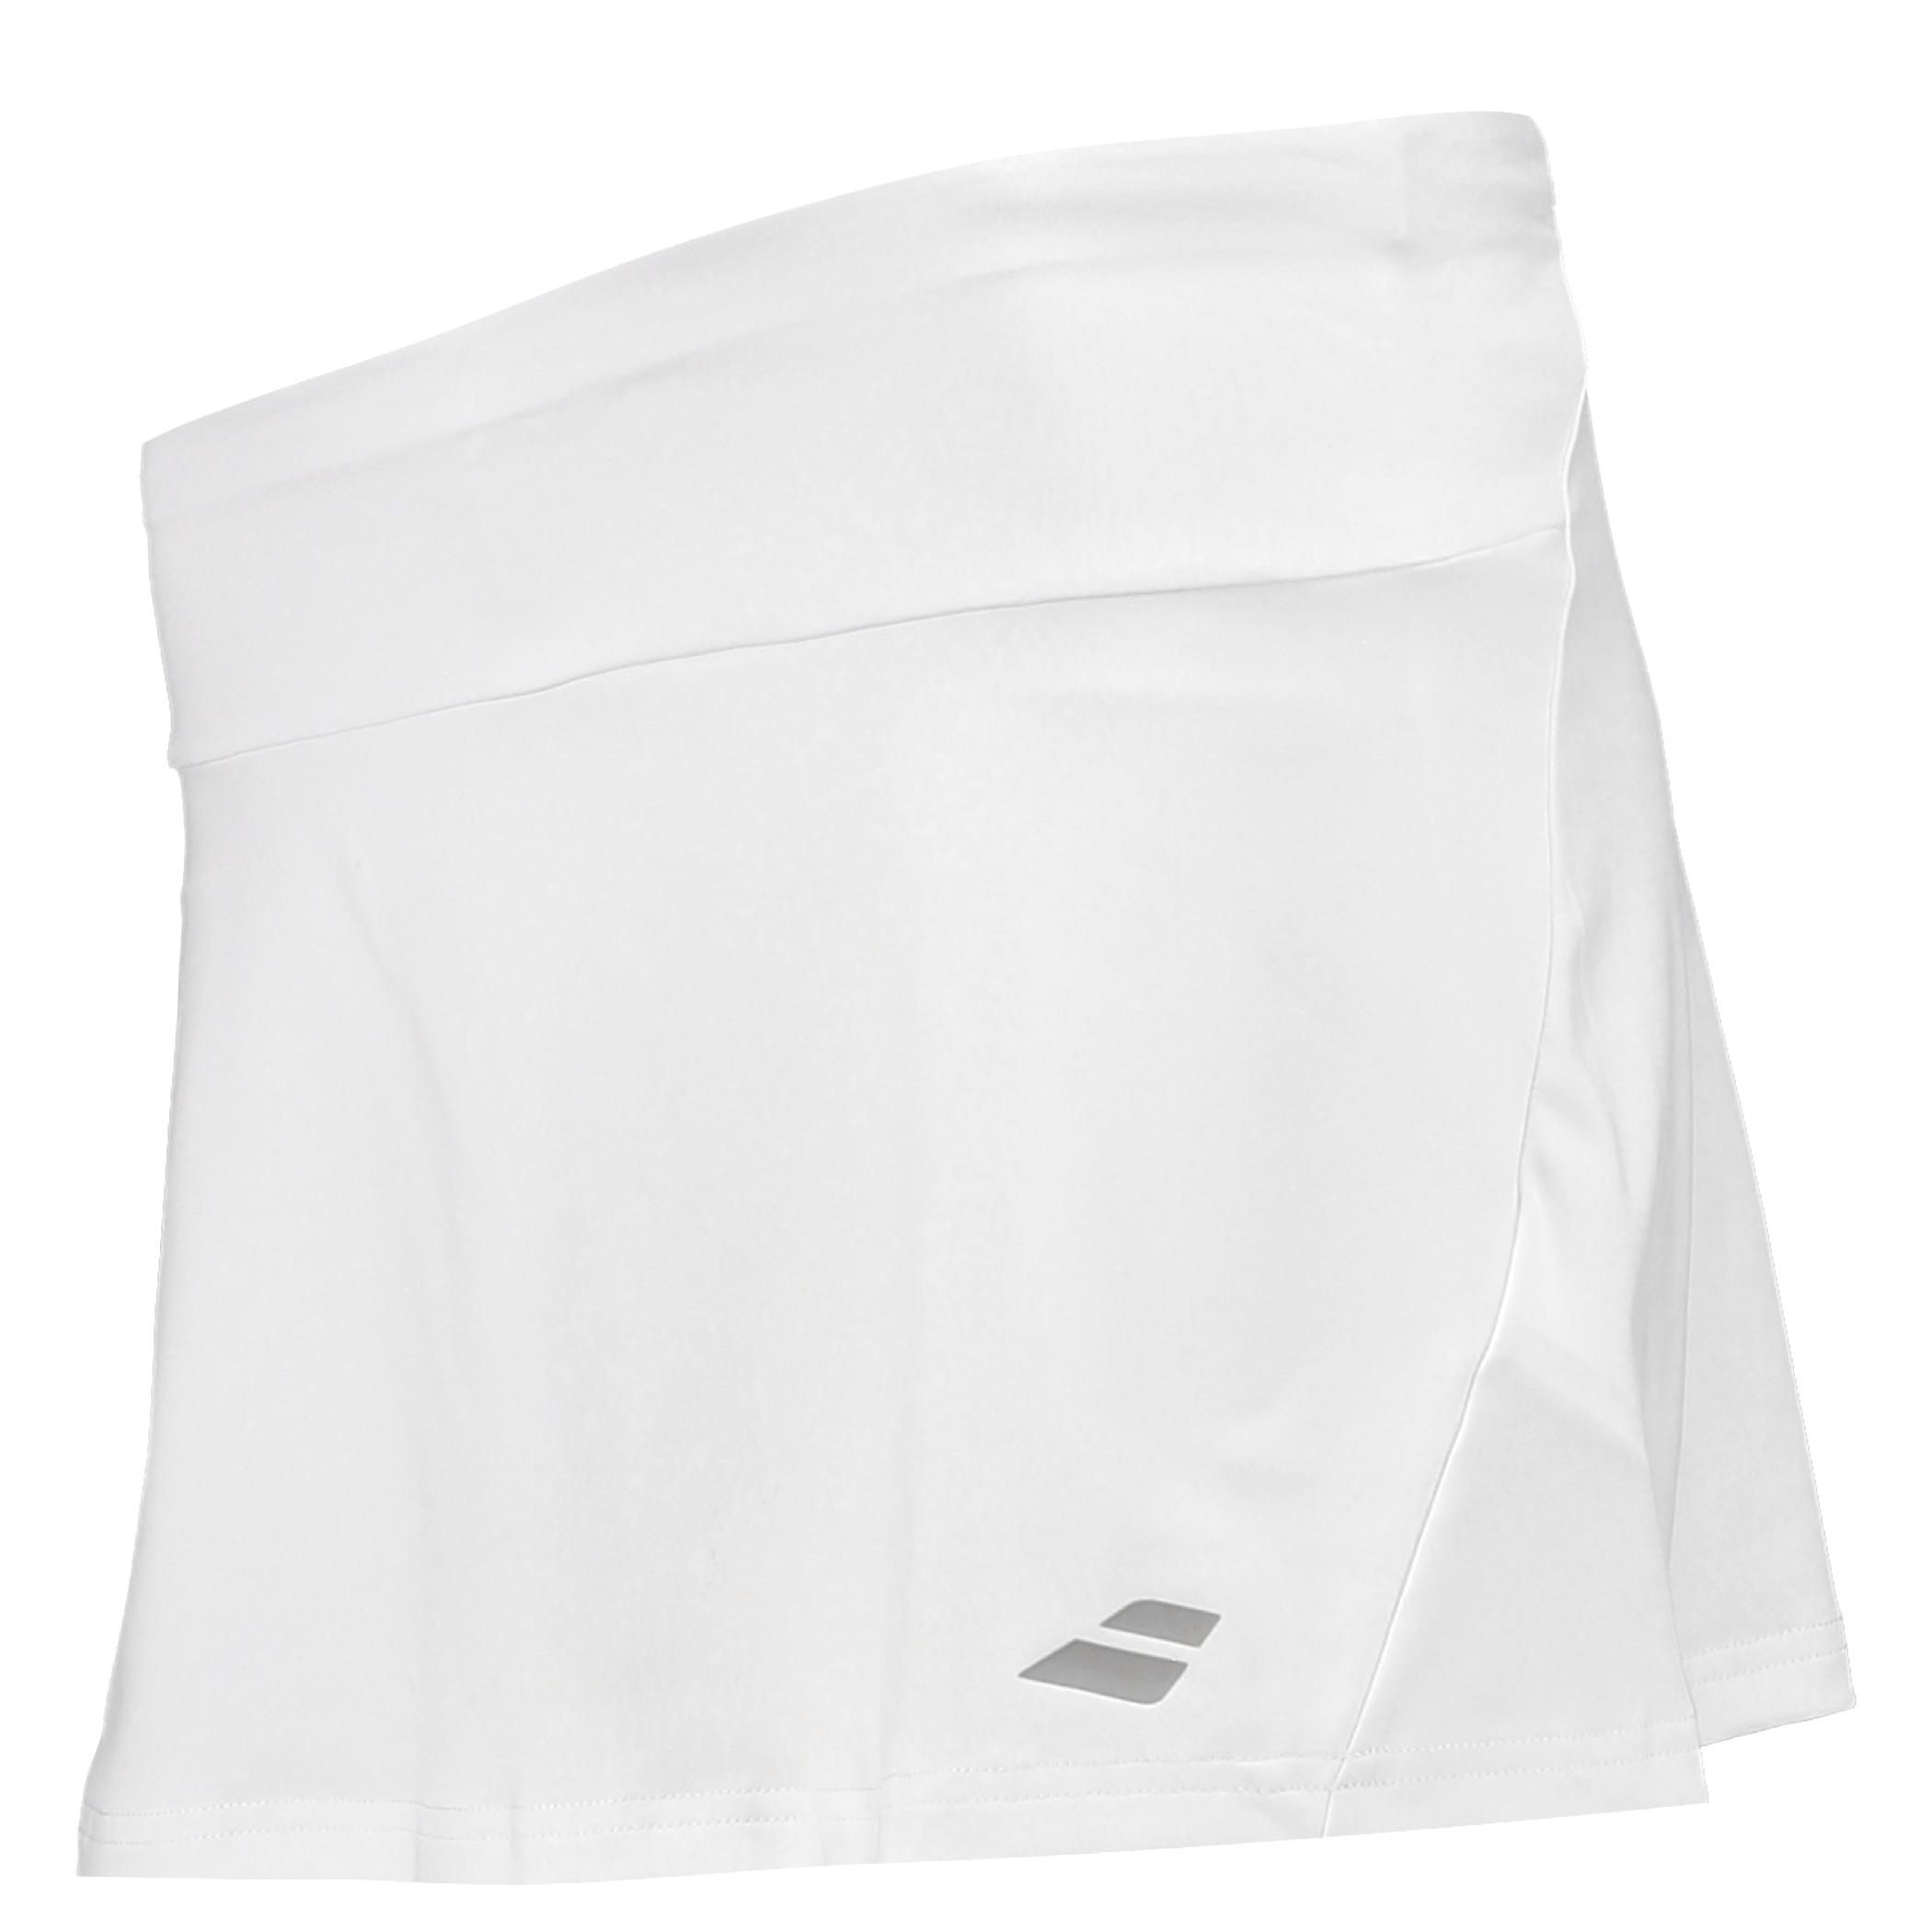 Wimbledon Babolat Performance Skirt - White - Ladies